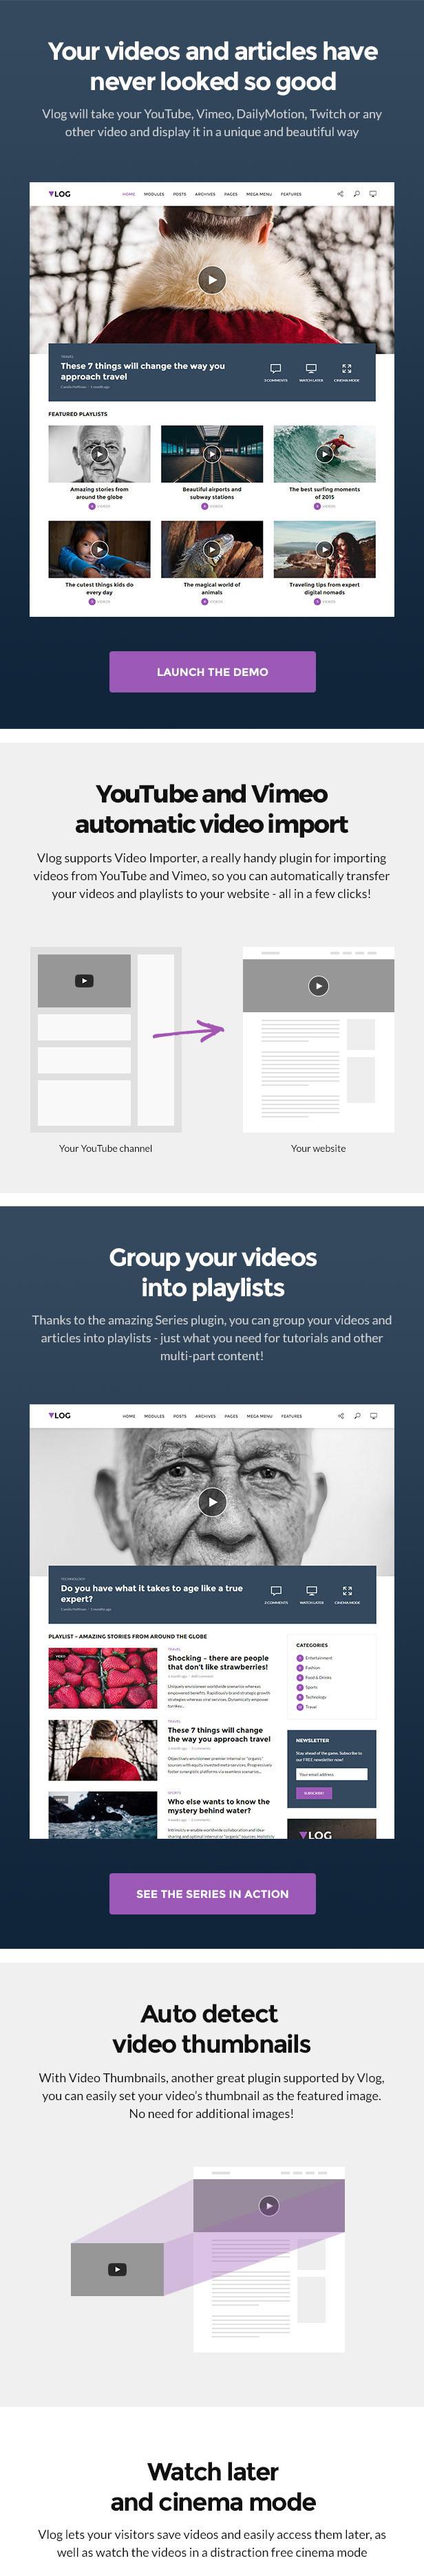 vlog features 01 v3 - Vlog - Video Blog & Podcast WordPress Theme